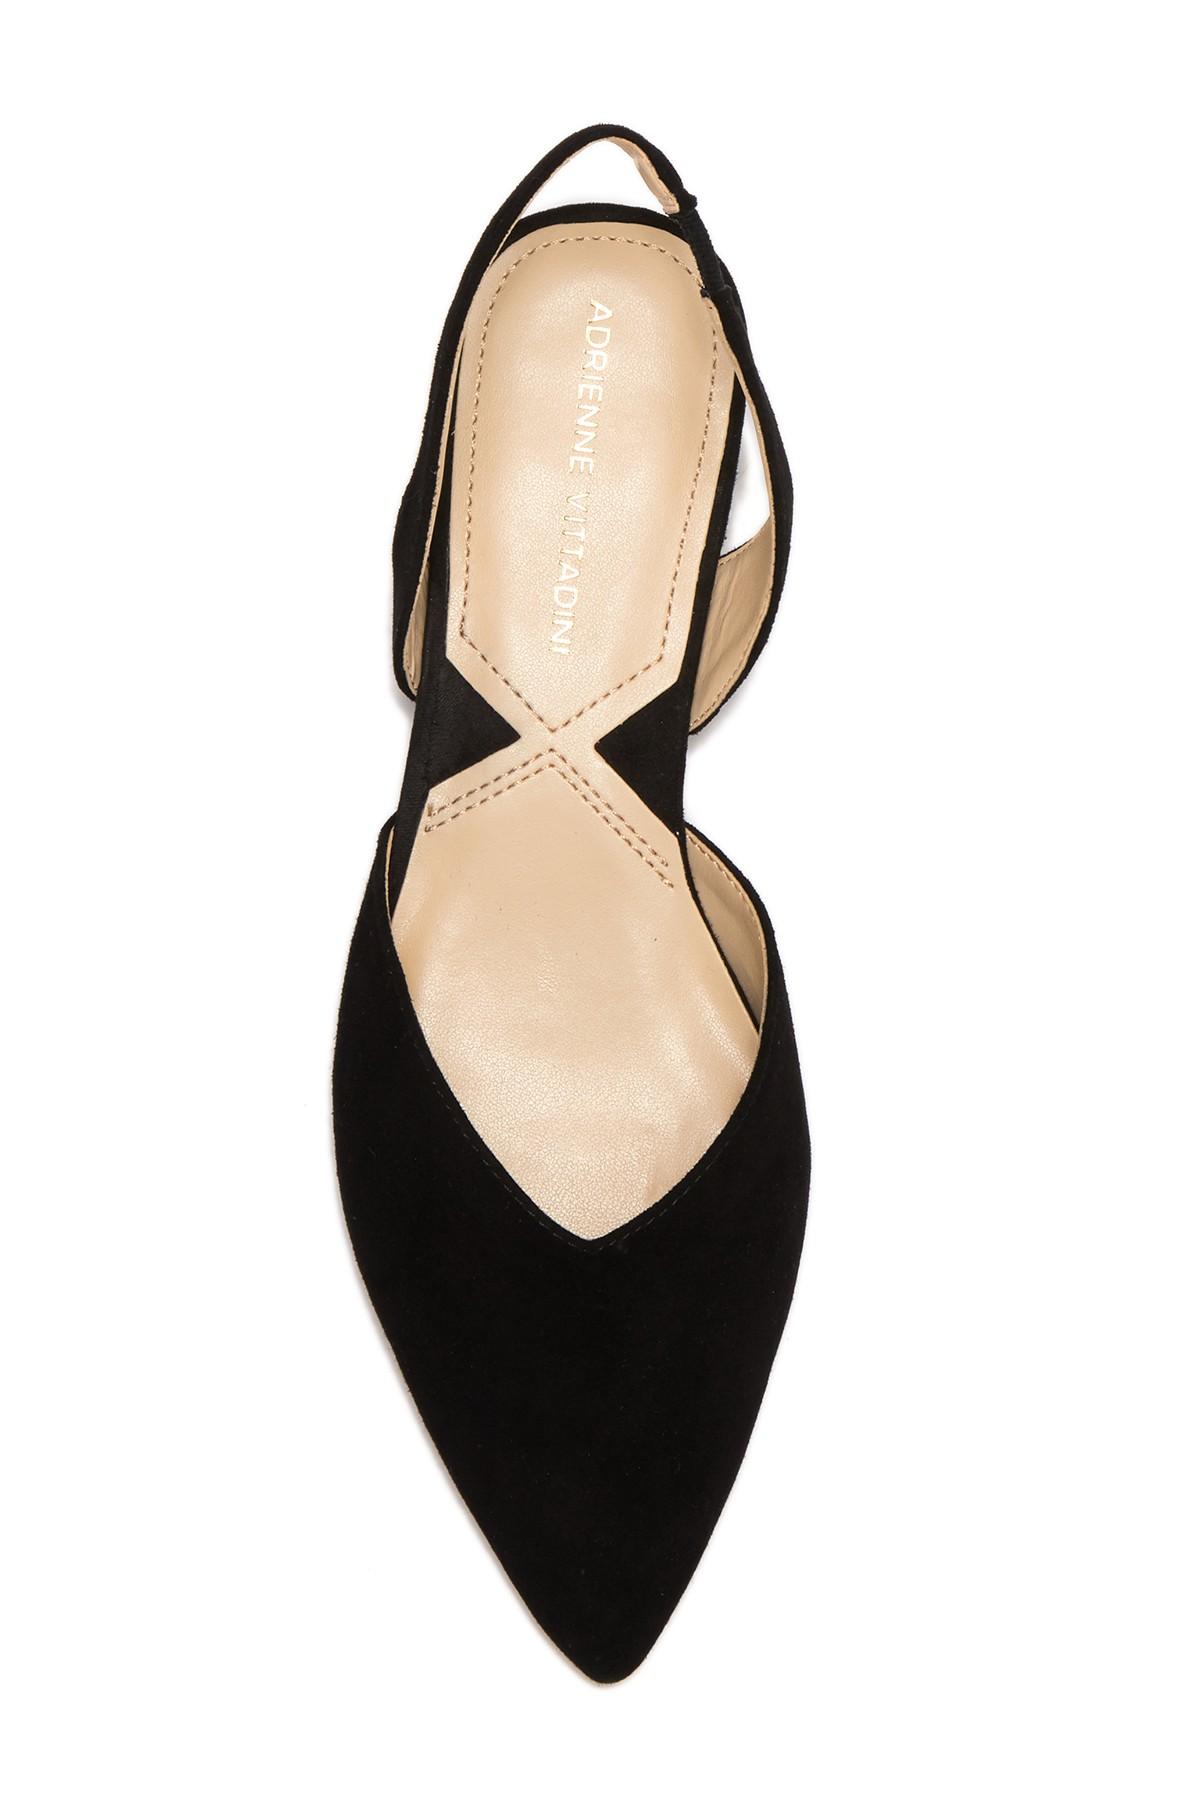 bbf2bd4c5 Adrienne Vittadini Womens Franny Leather Pointed Toe SlingBack ...